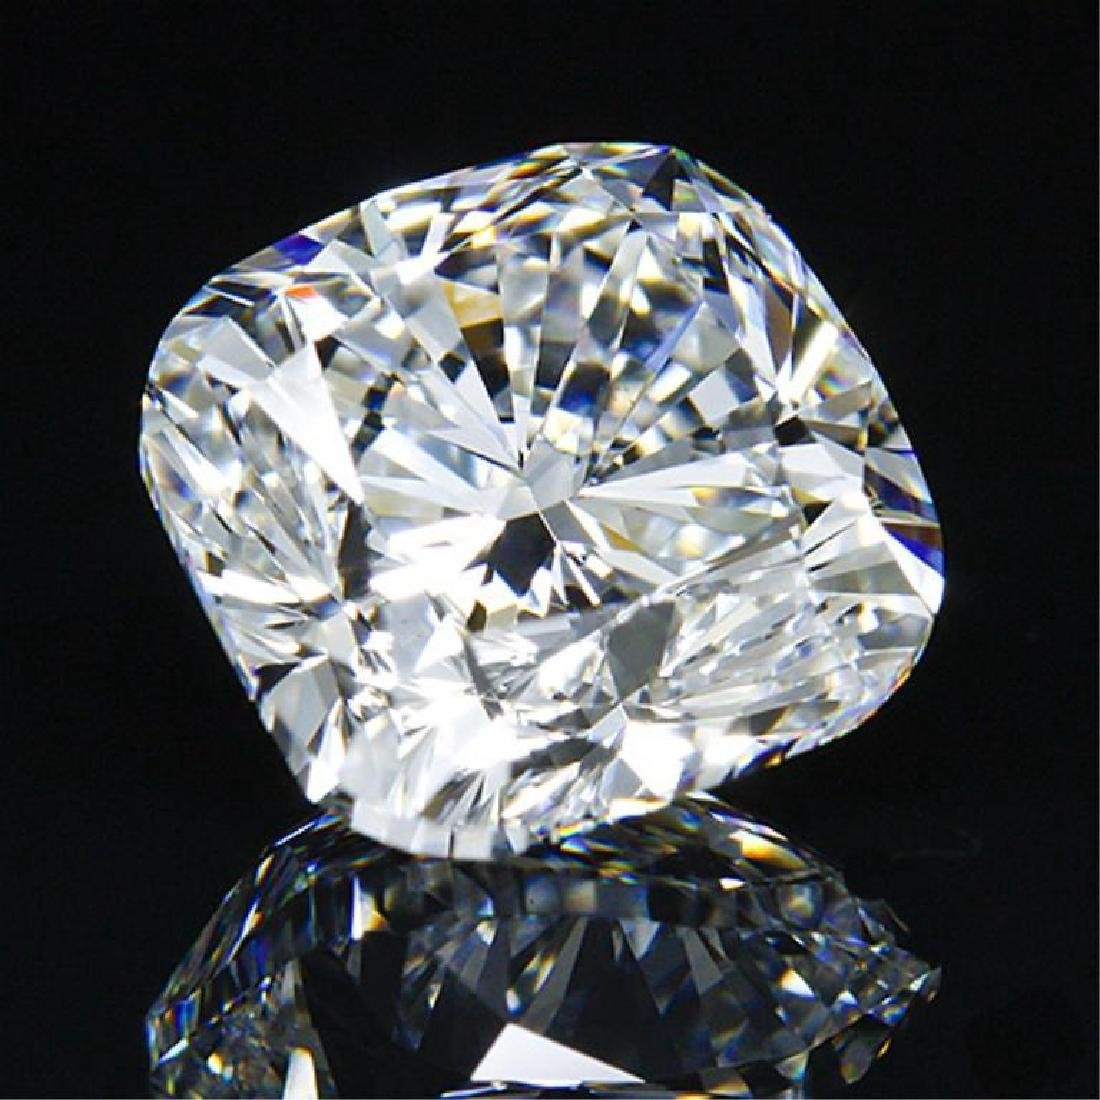 Hand-made Malachite Gemstone Jewel Box